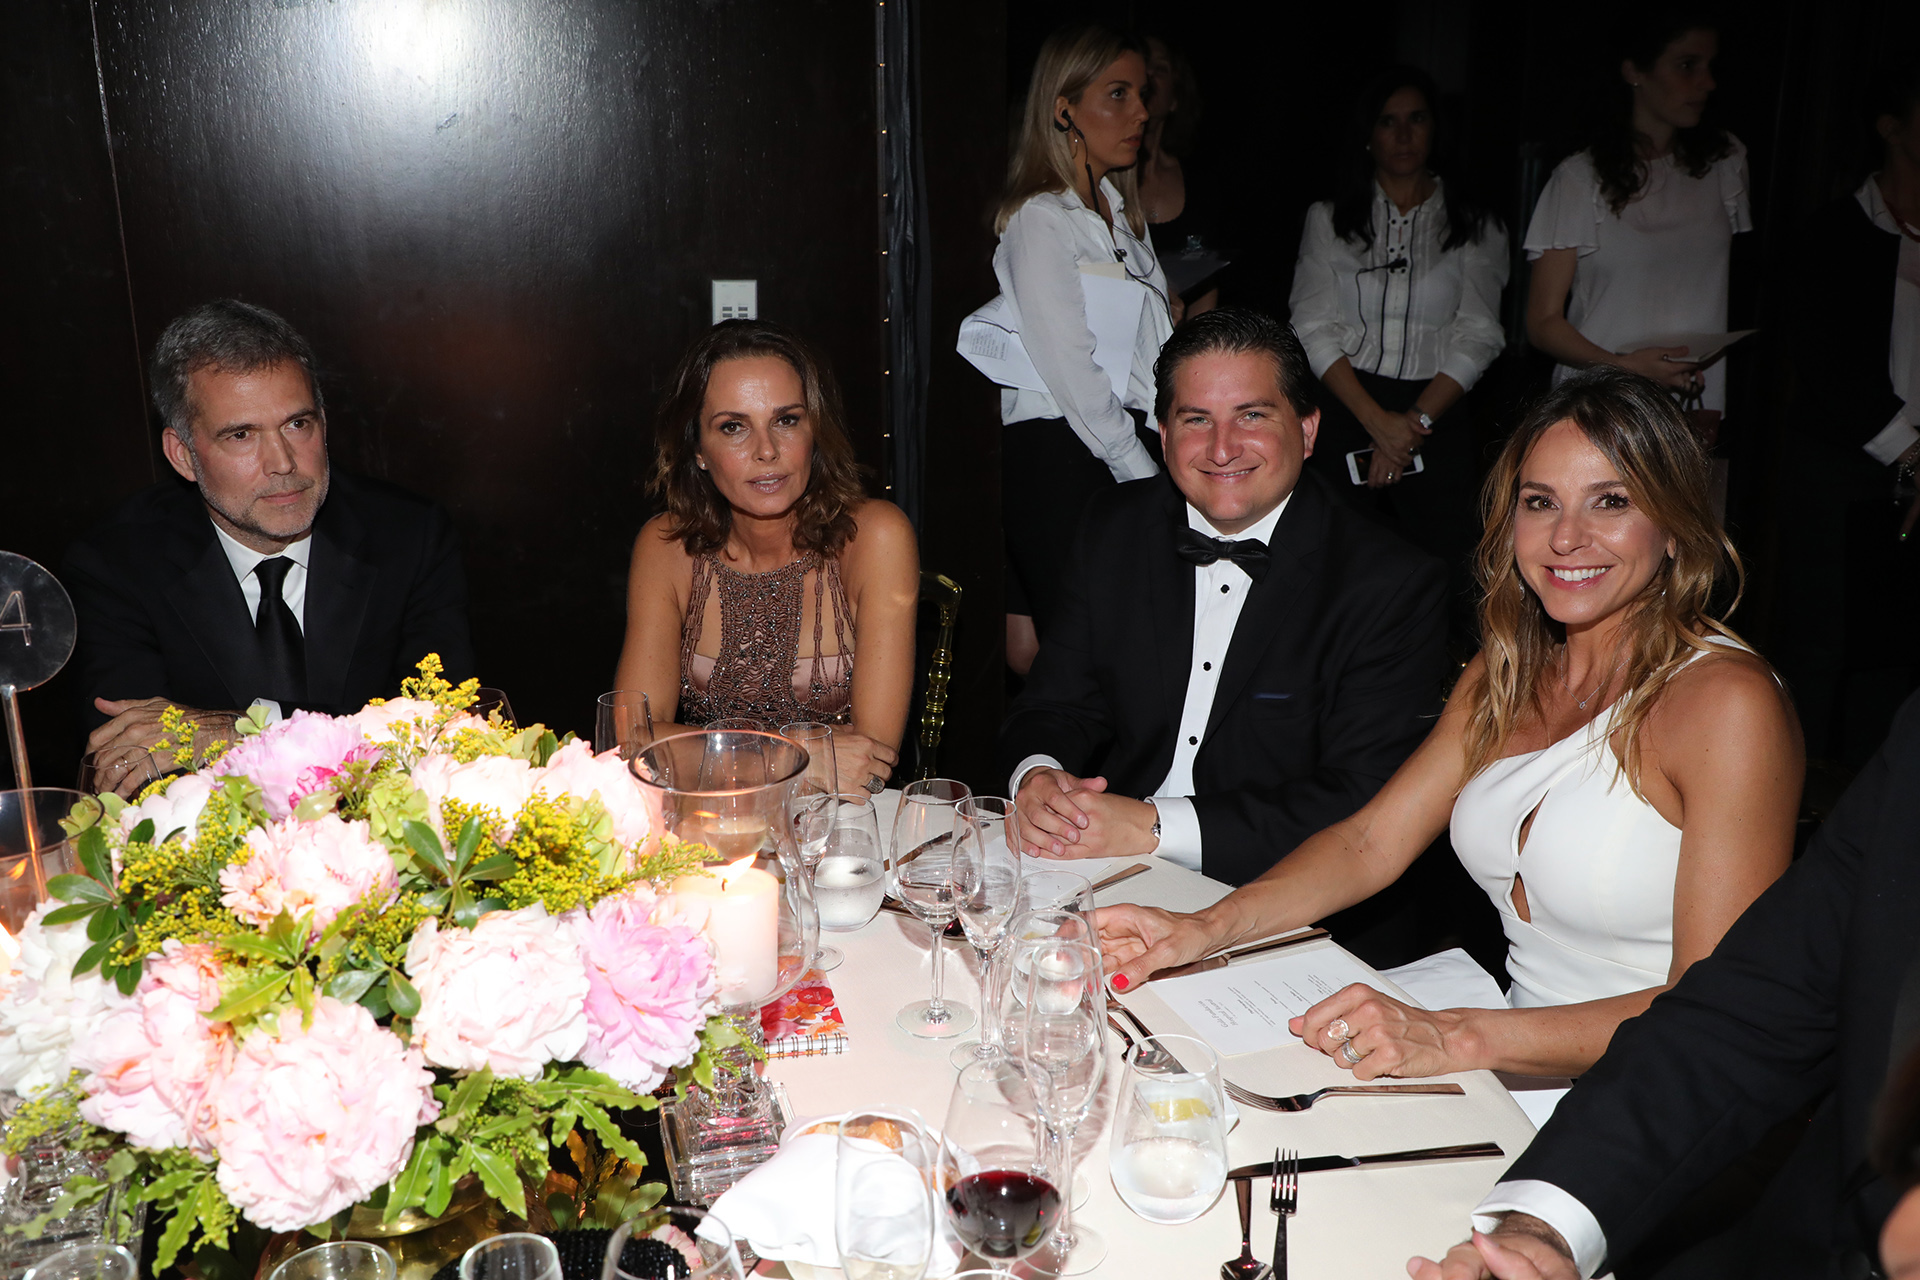 Augusto Rodríguez Larreta, Nathalie Sielecki, Gastón Corral y Soledad Urtubey